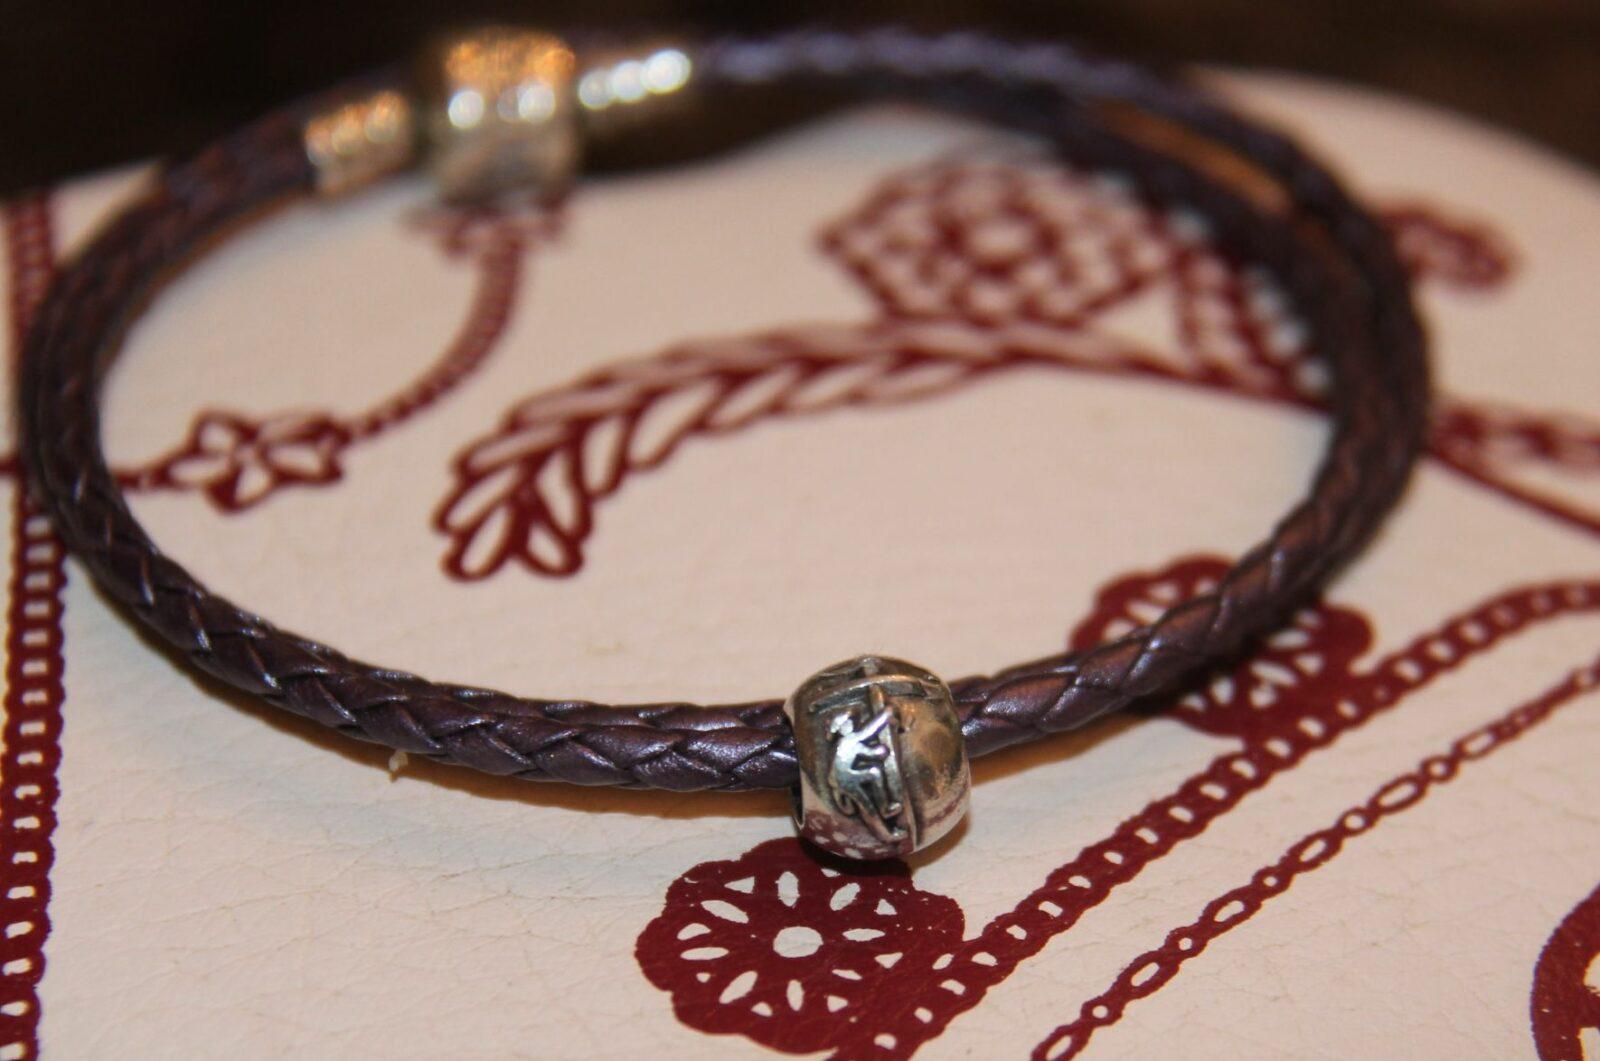 European Style Charm Bracelet beads- Lineman themed